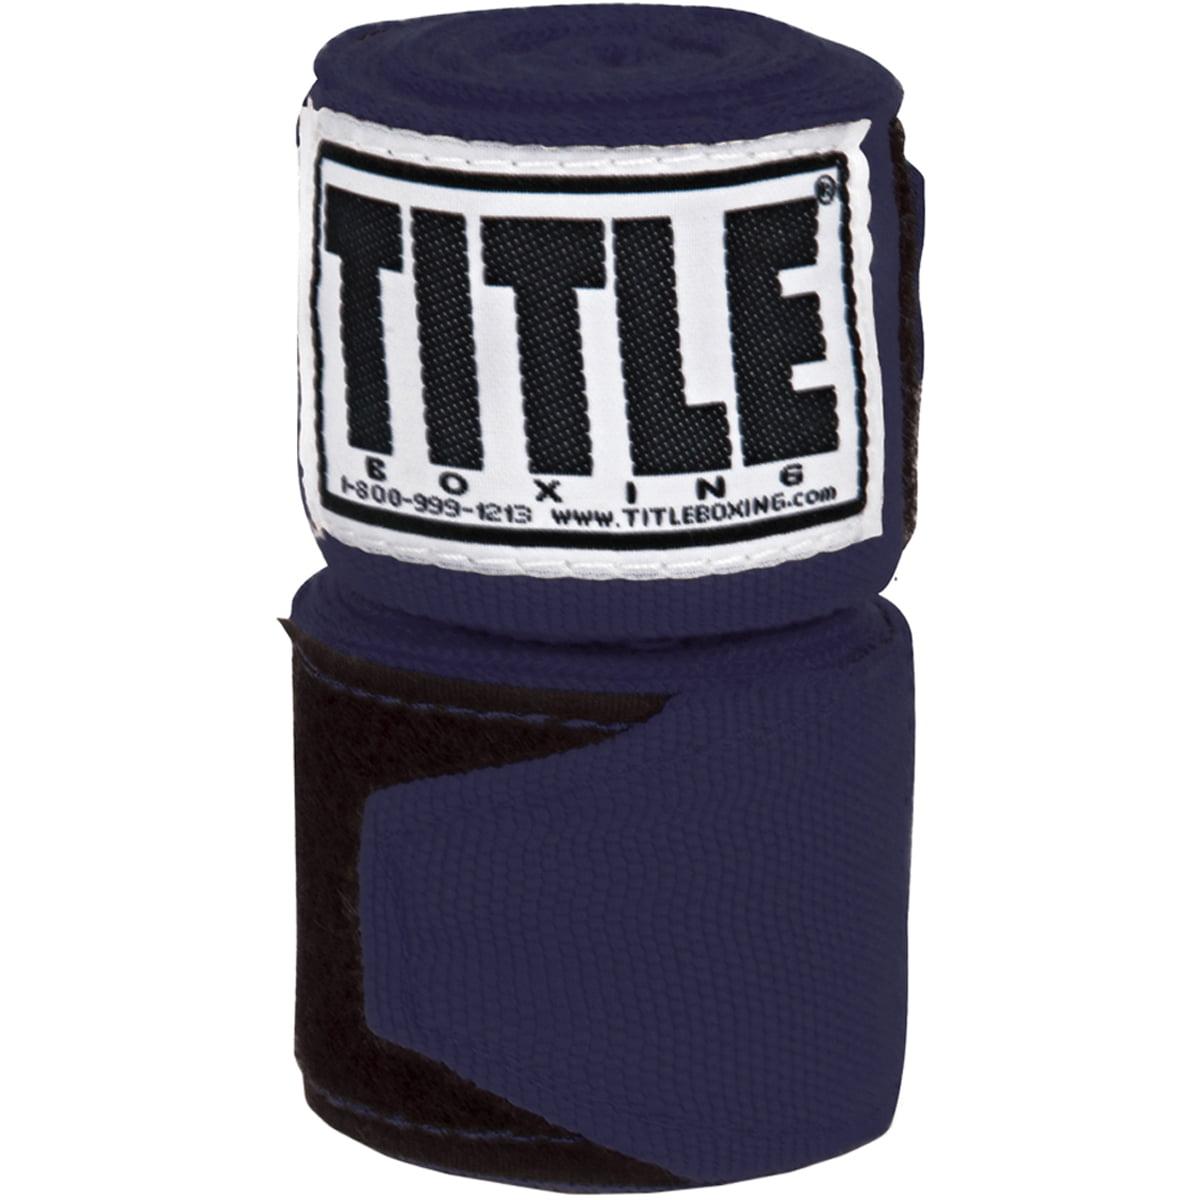 "Title Boxing 120"" Semi Elastic Handwraps - Navy"